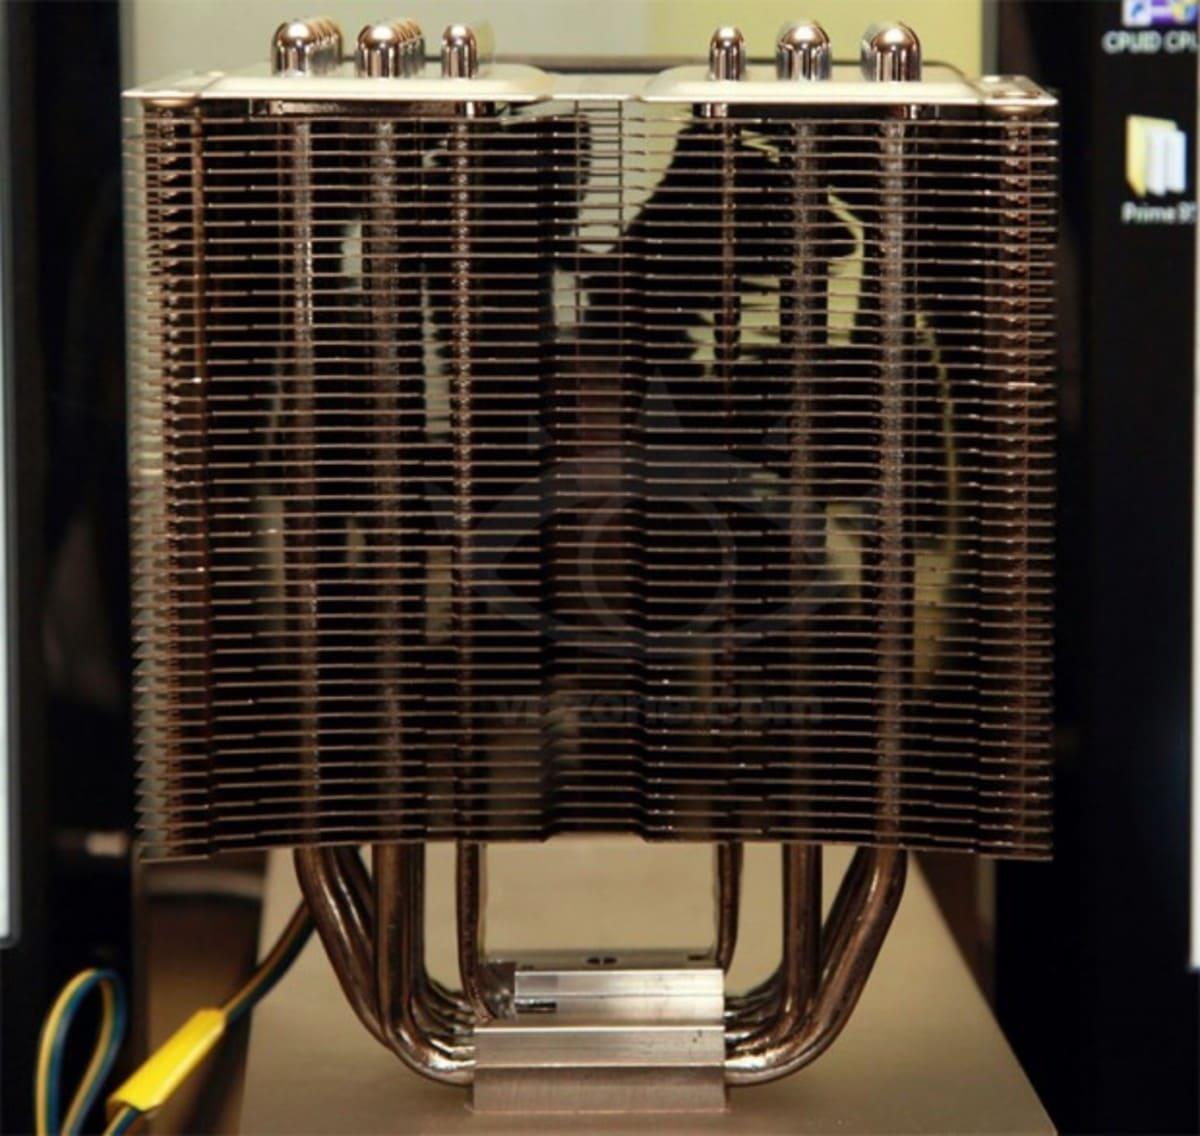 Cooler Master TPC 812 3 620x587 2